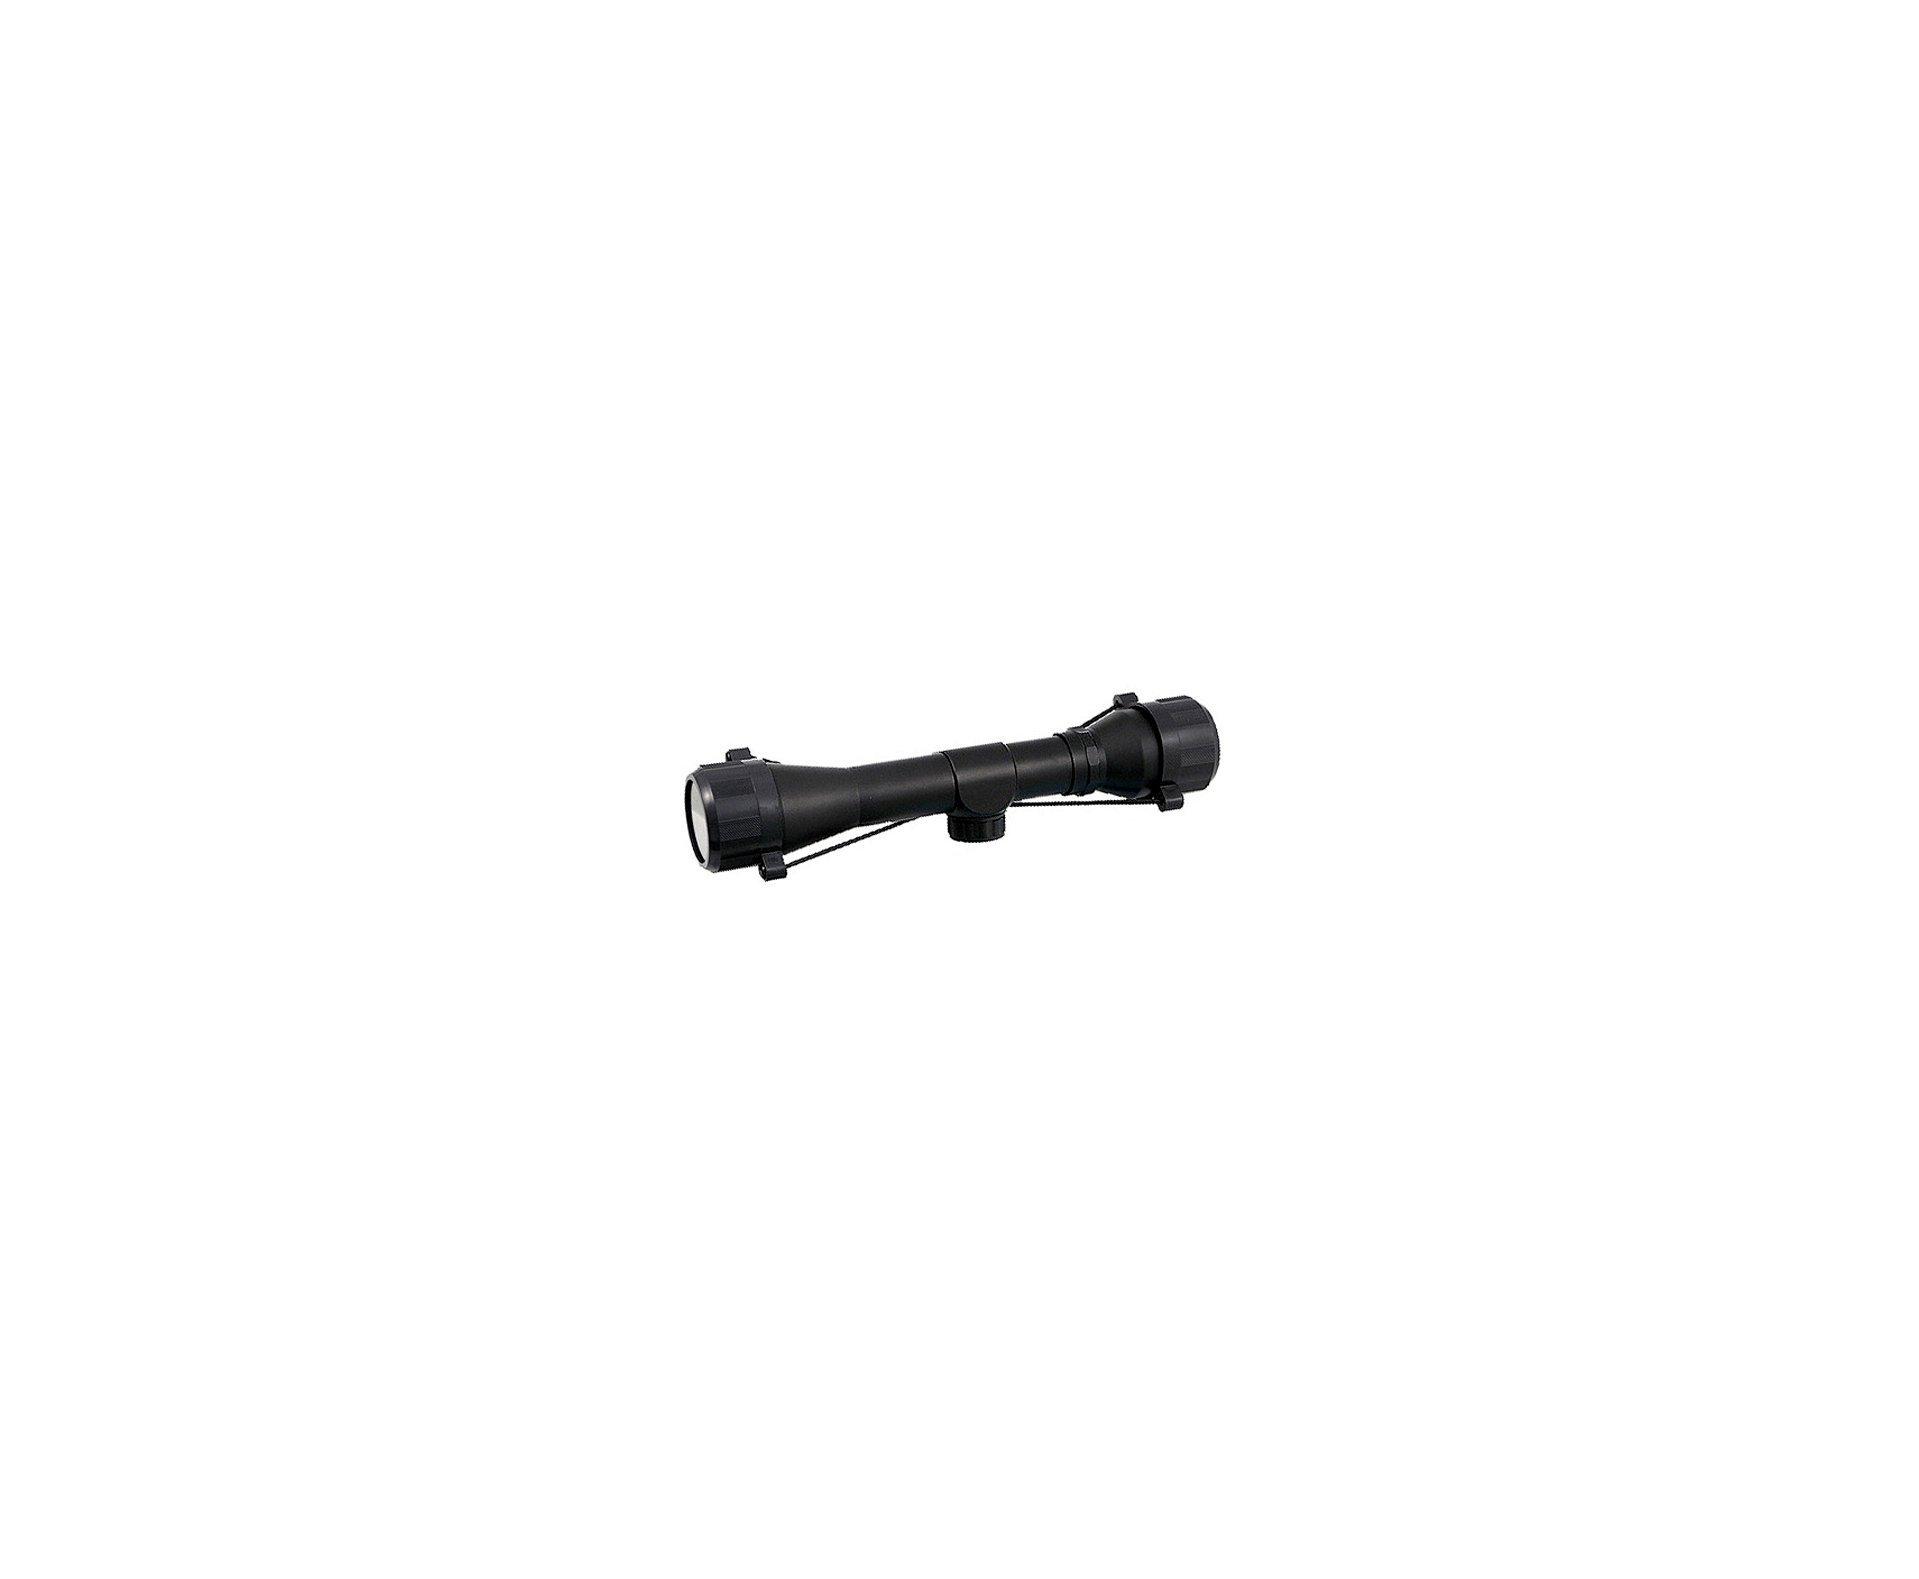 Carabina De Pressão Cbc F22 Advanced Nitro - Cal 5,5 + Luneta 4x32